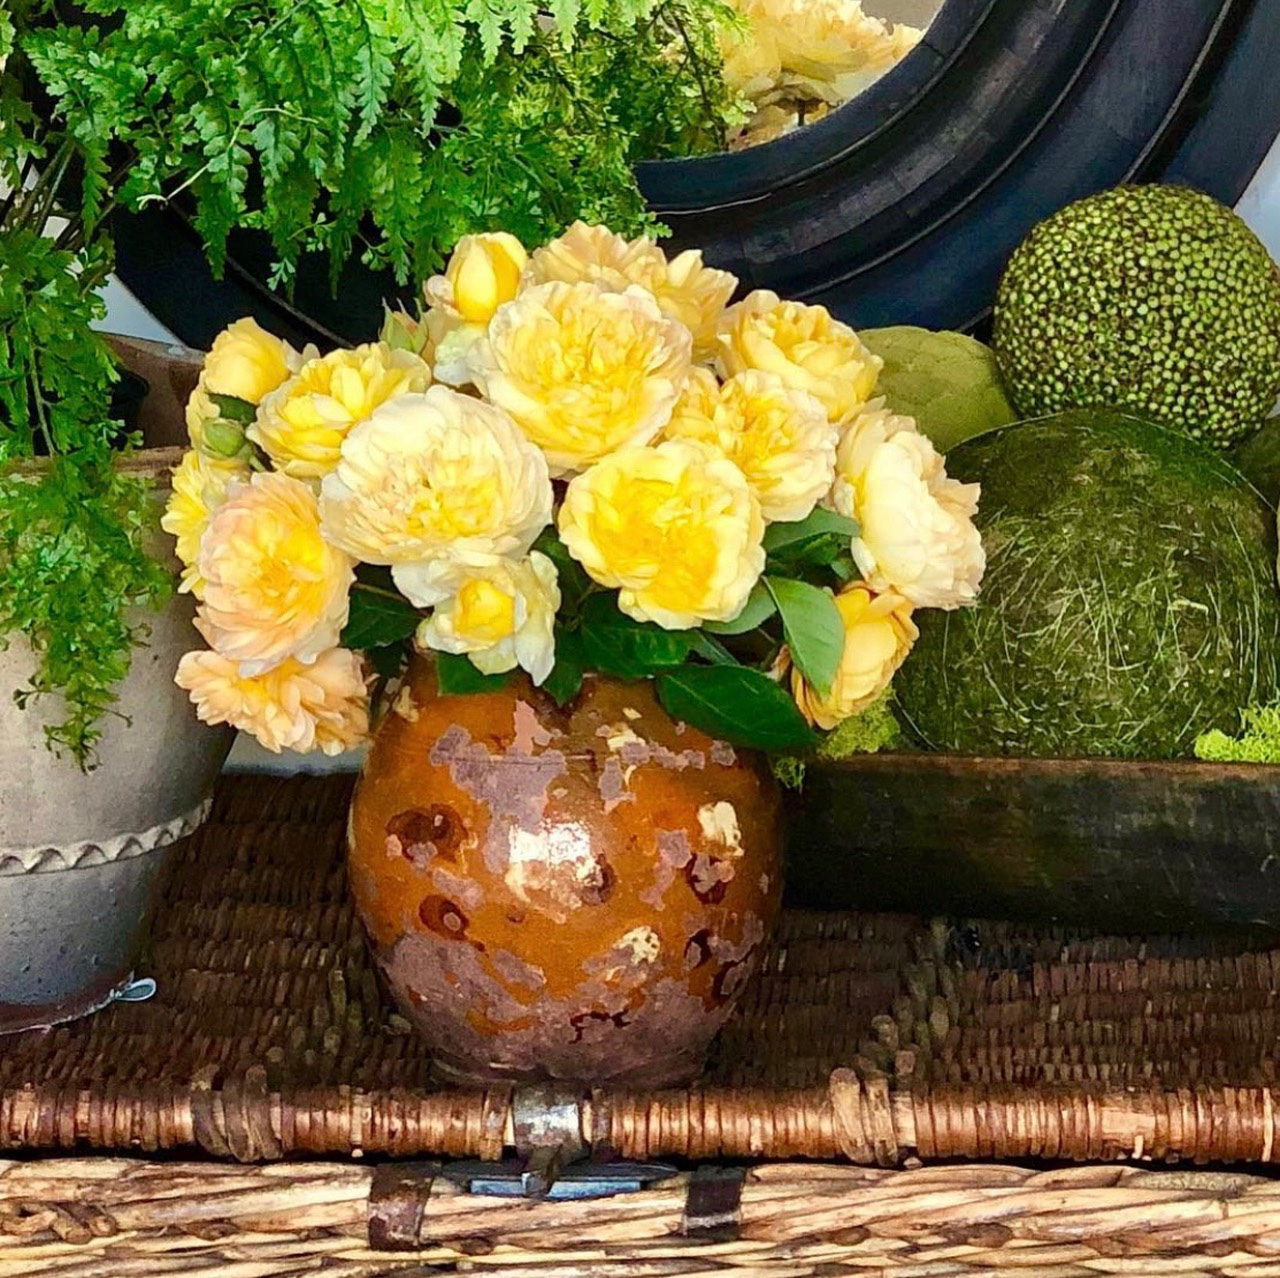 david austin roses in redware vessel cindy hattersley